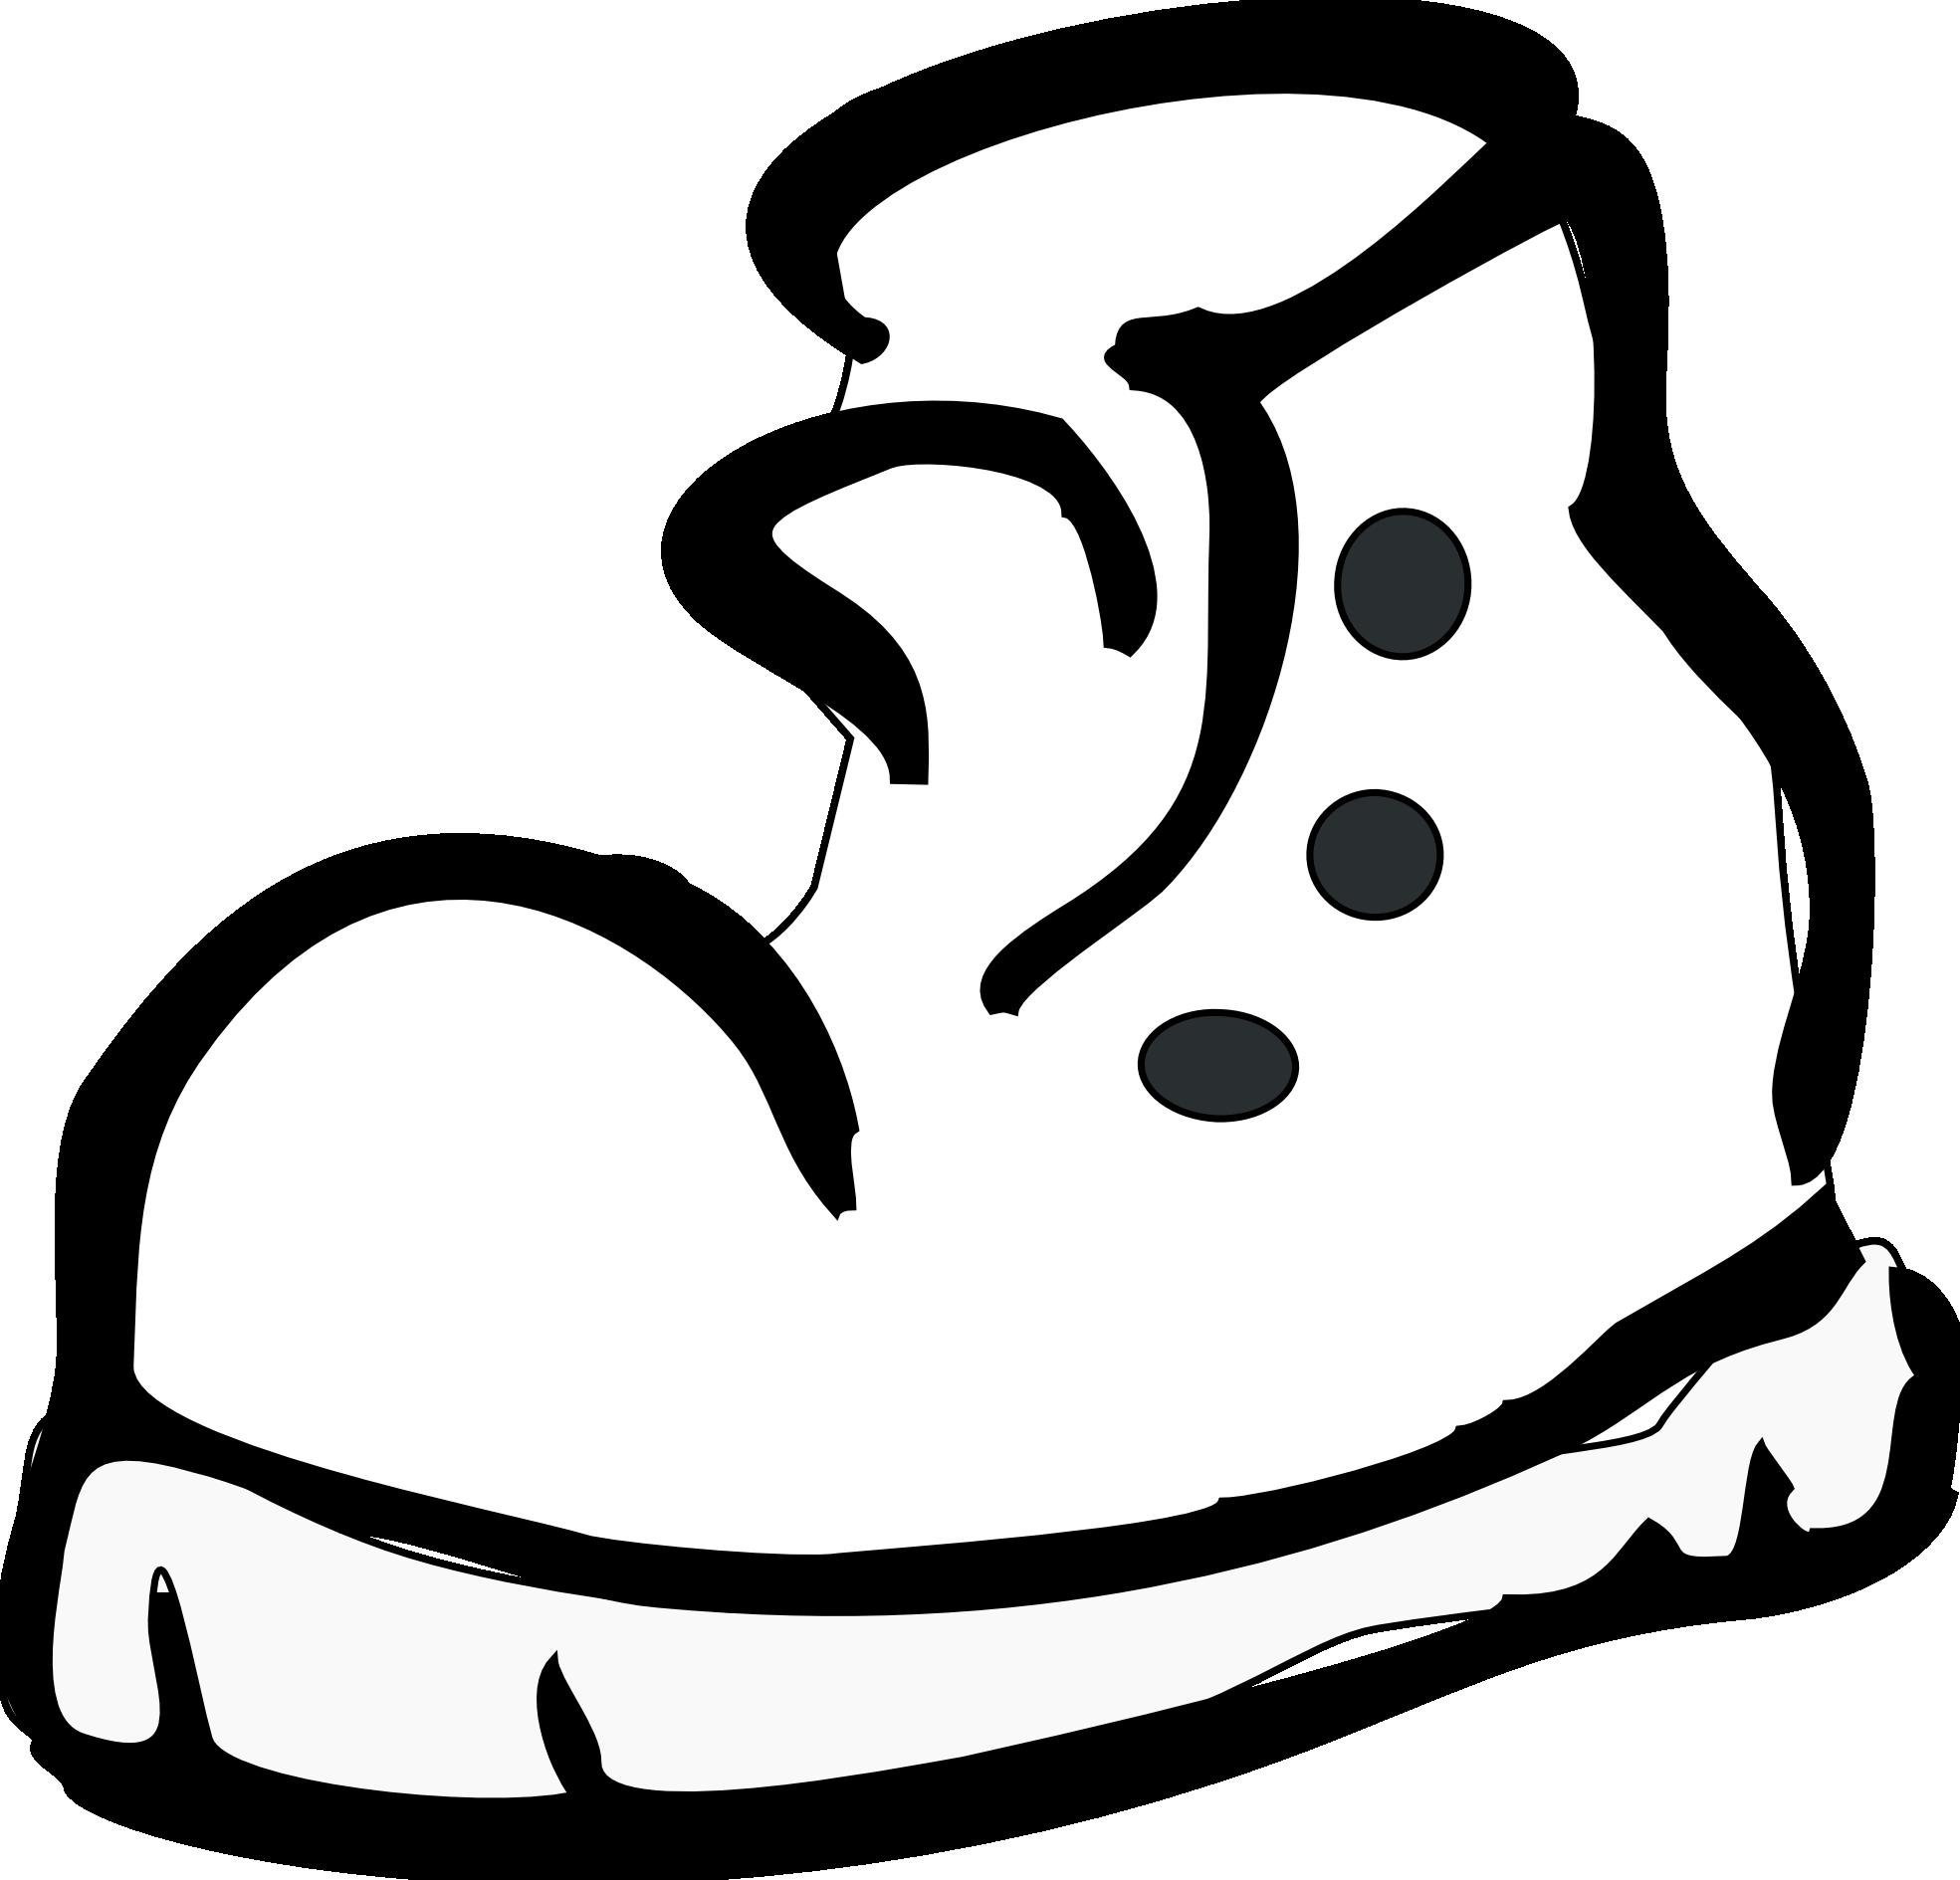 Clipart socks socks nike. Running shoes panda free